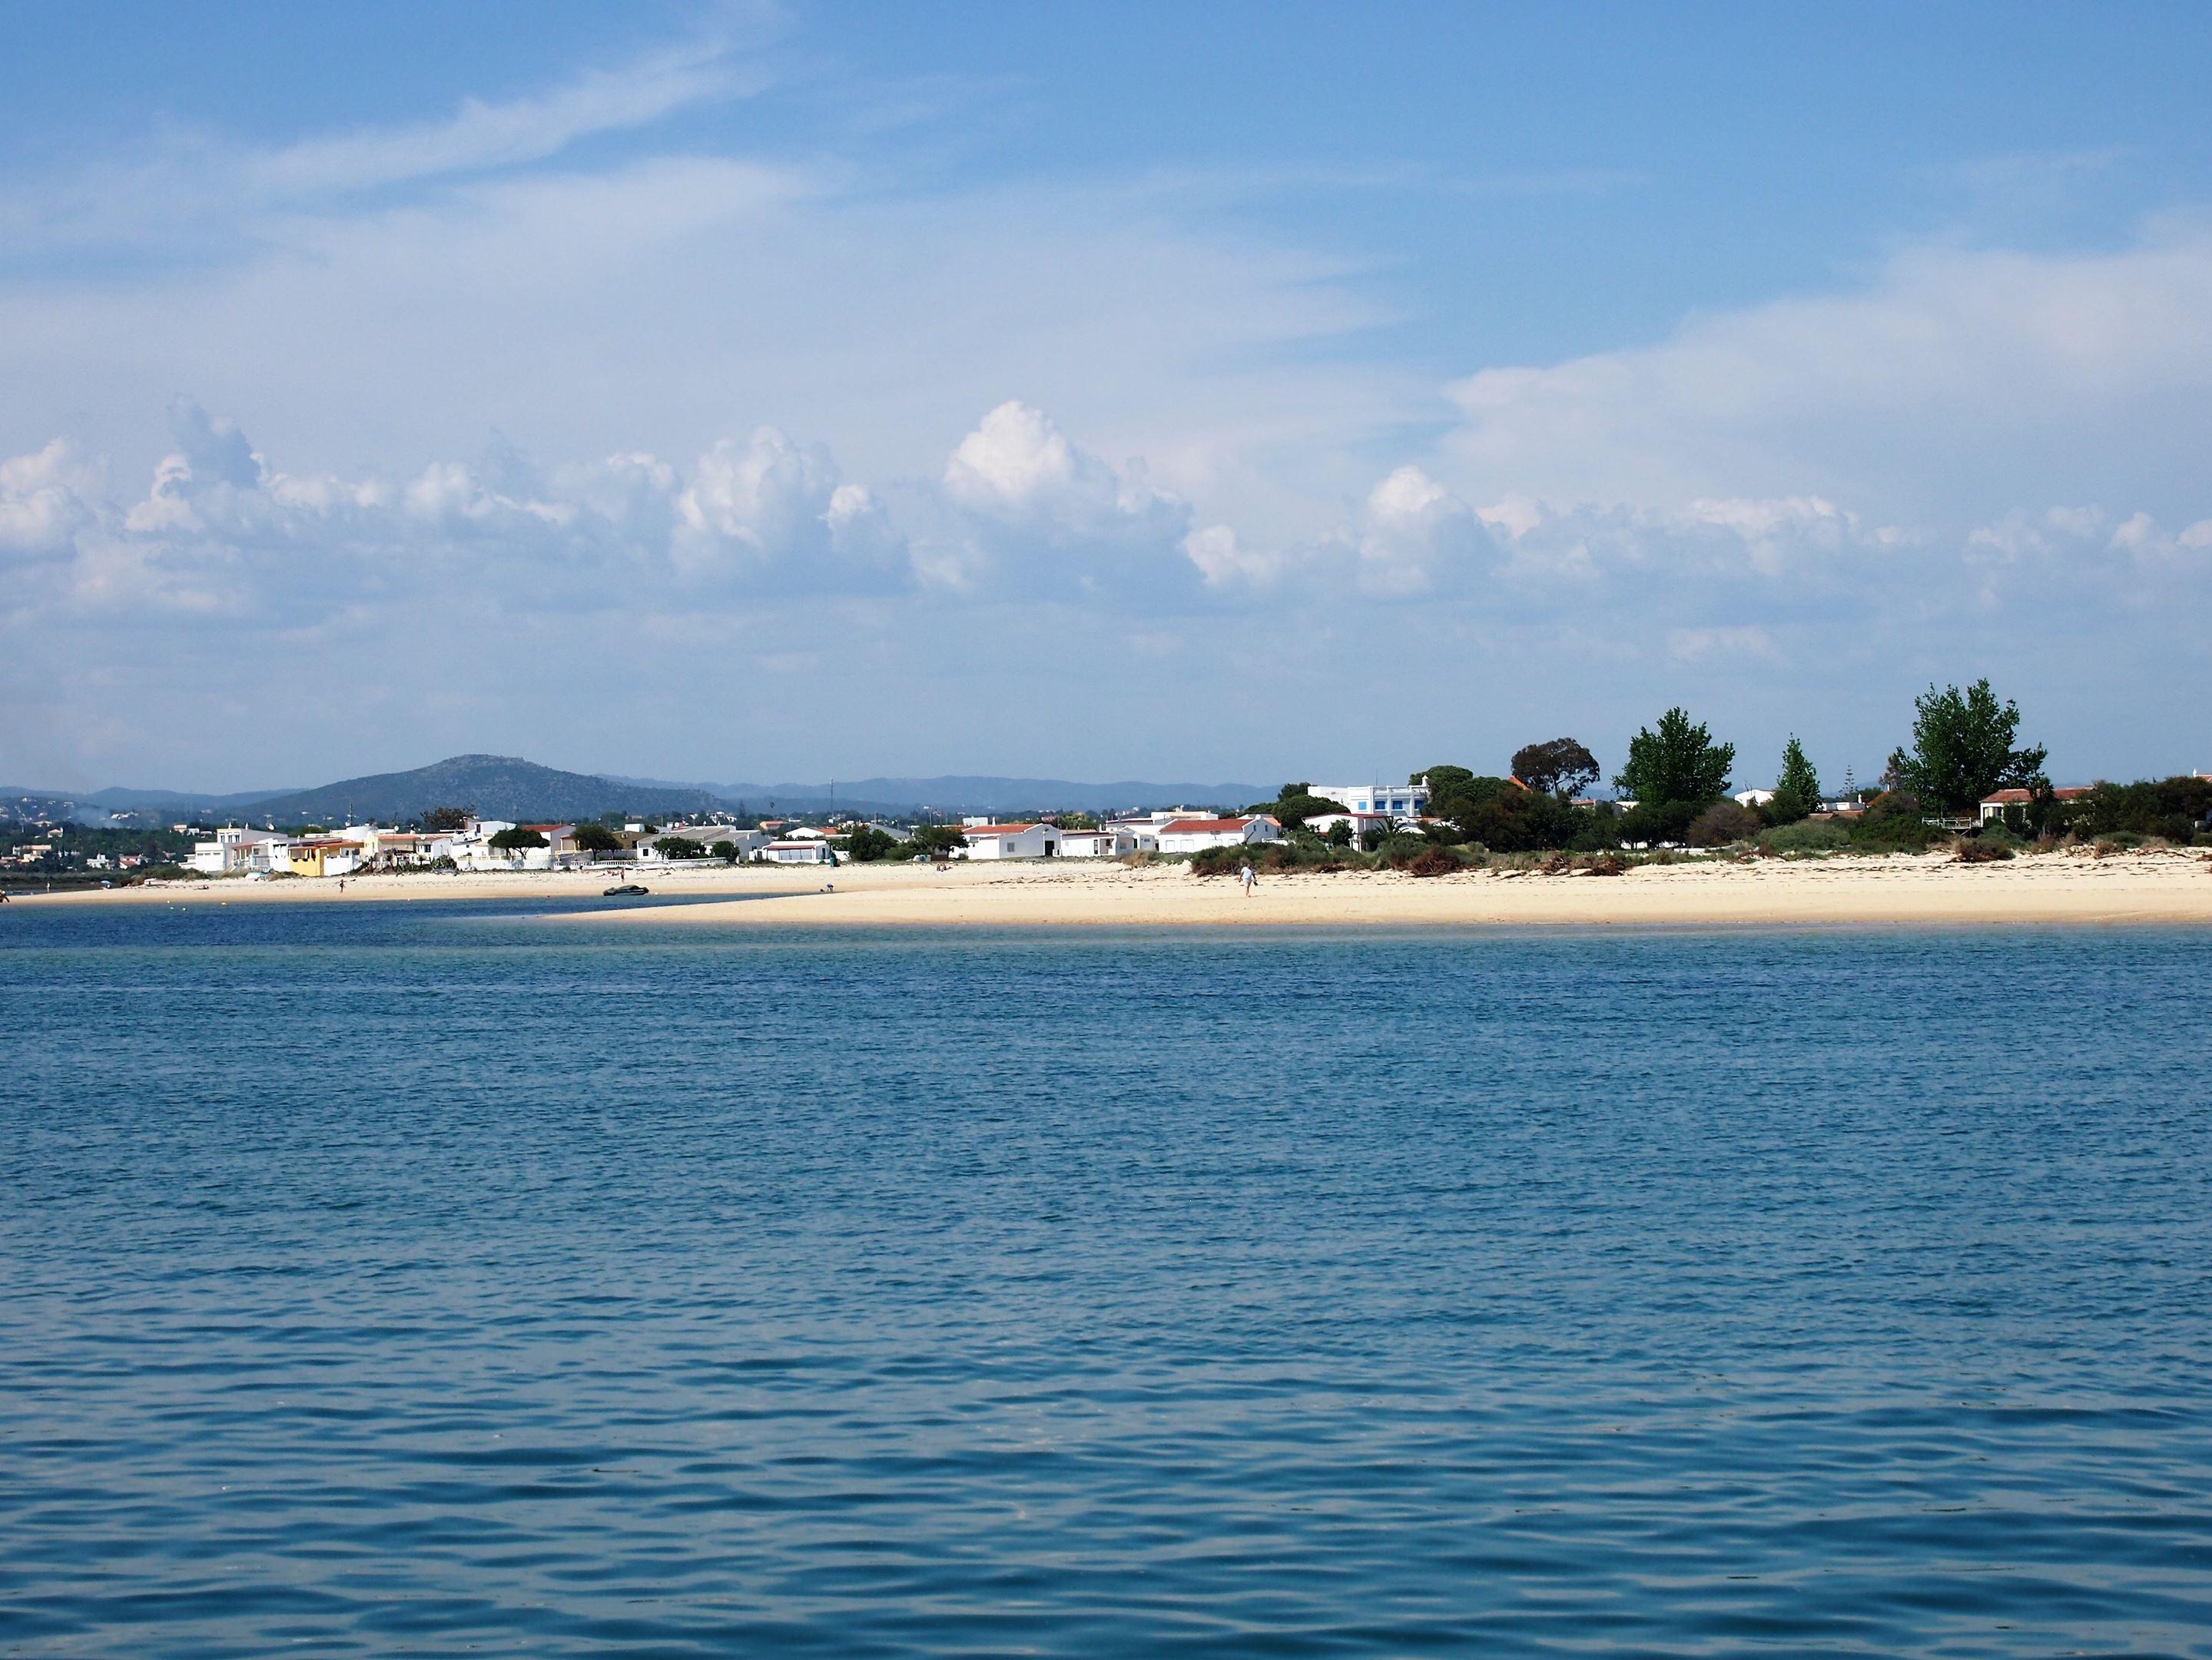 Praia da Armona at Ilha da Armona, near Olhão